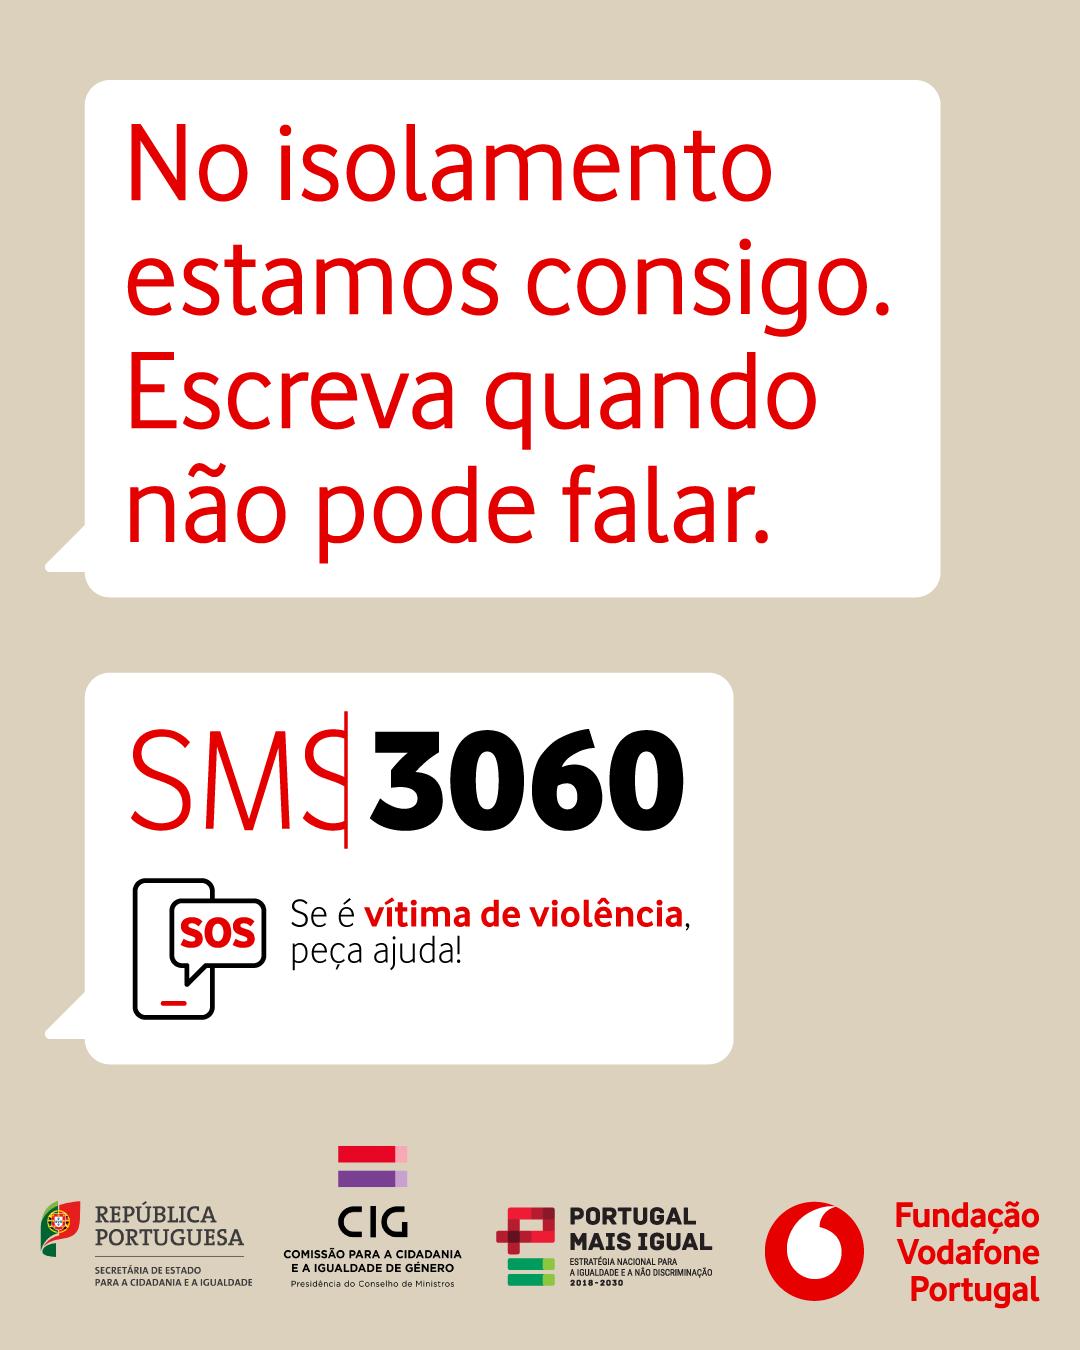 3060 SMS Line